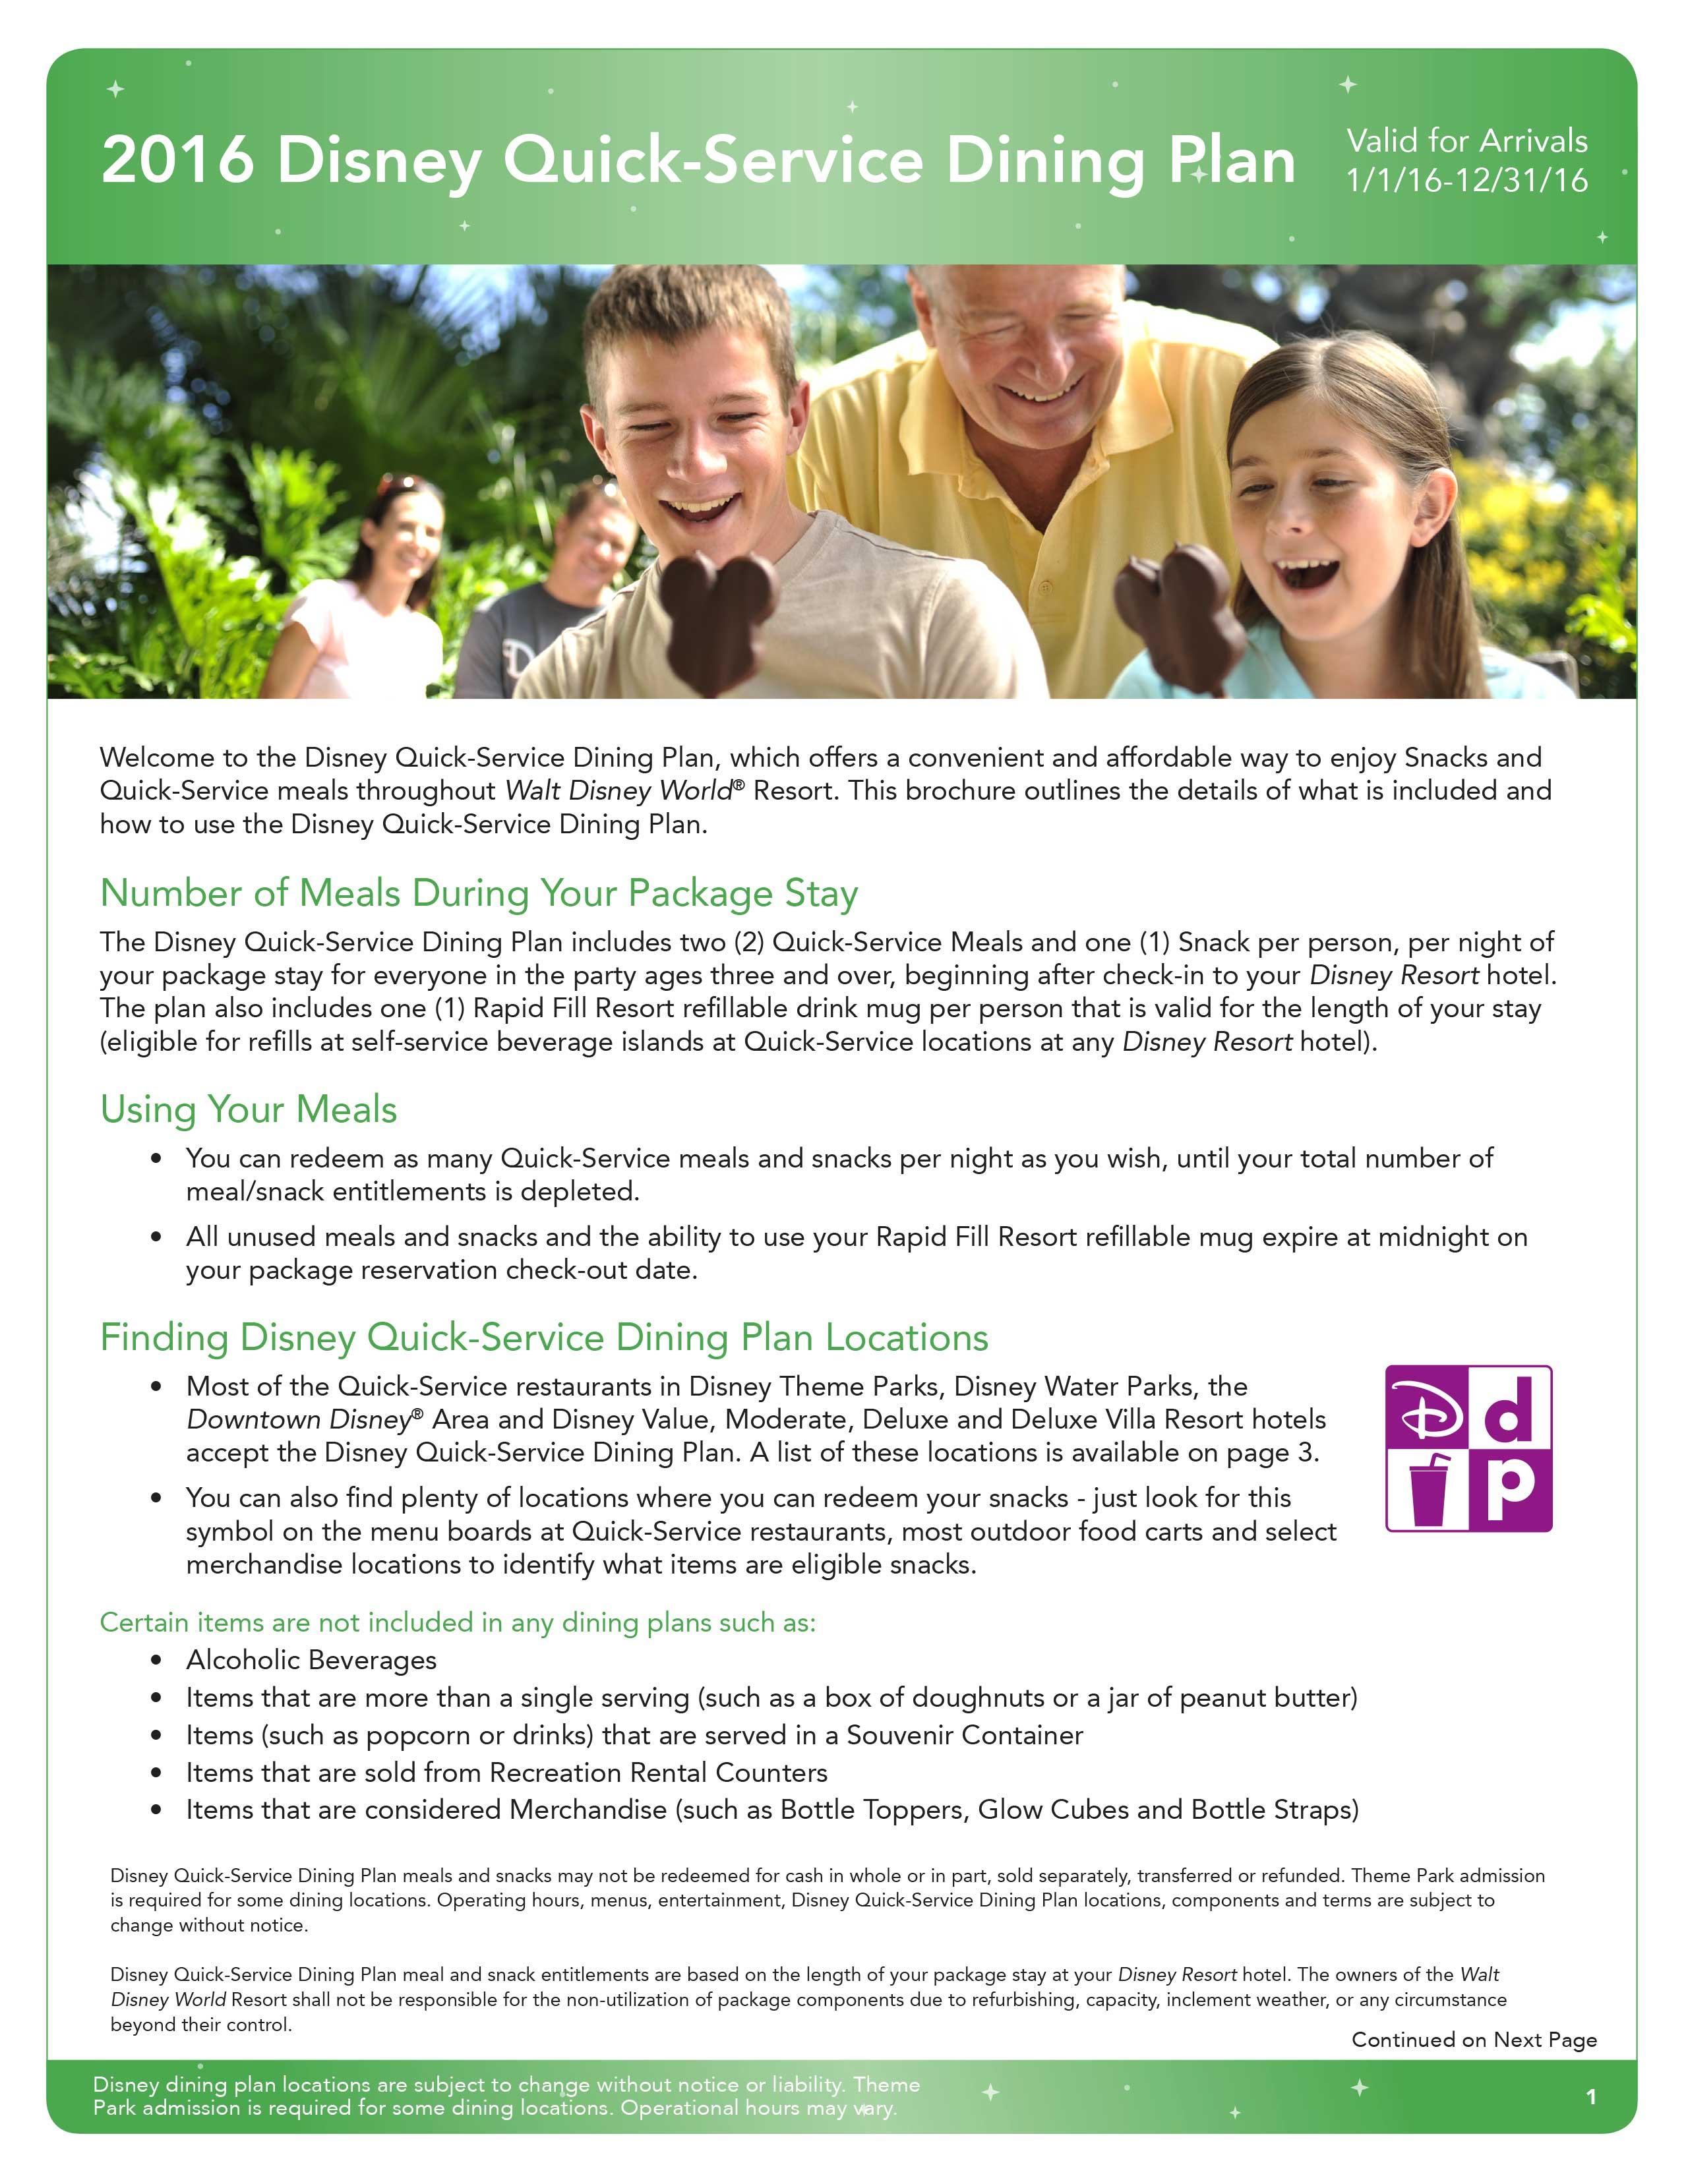 2016 Disney Dining Plan brochures